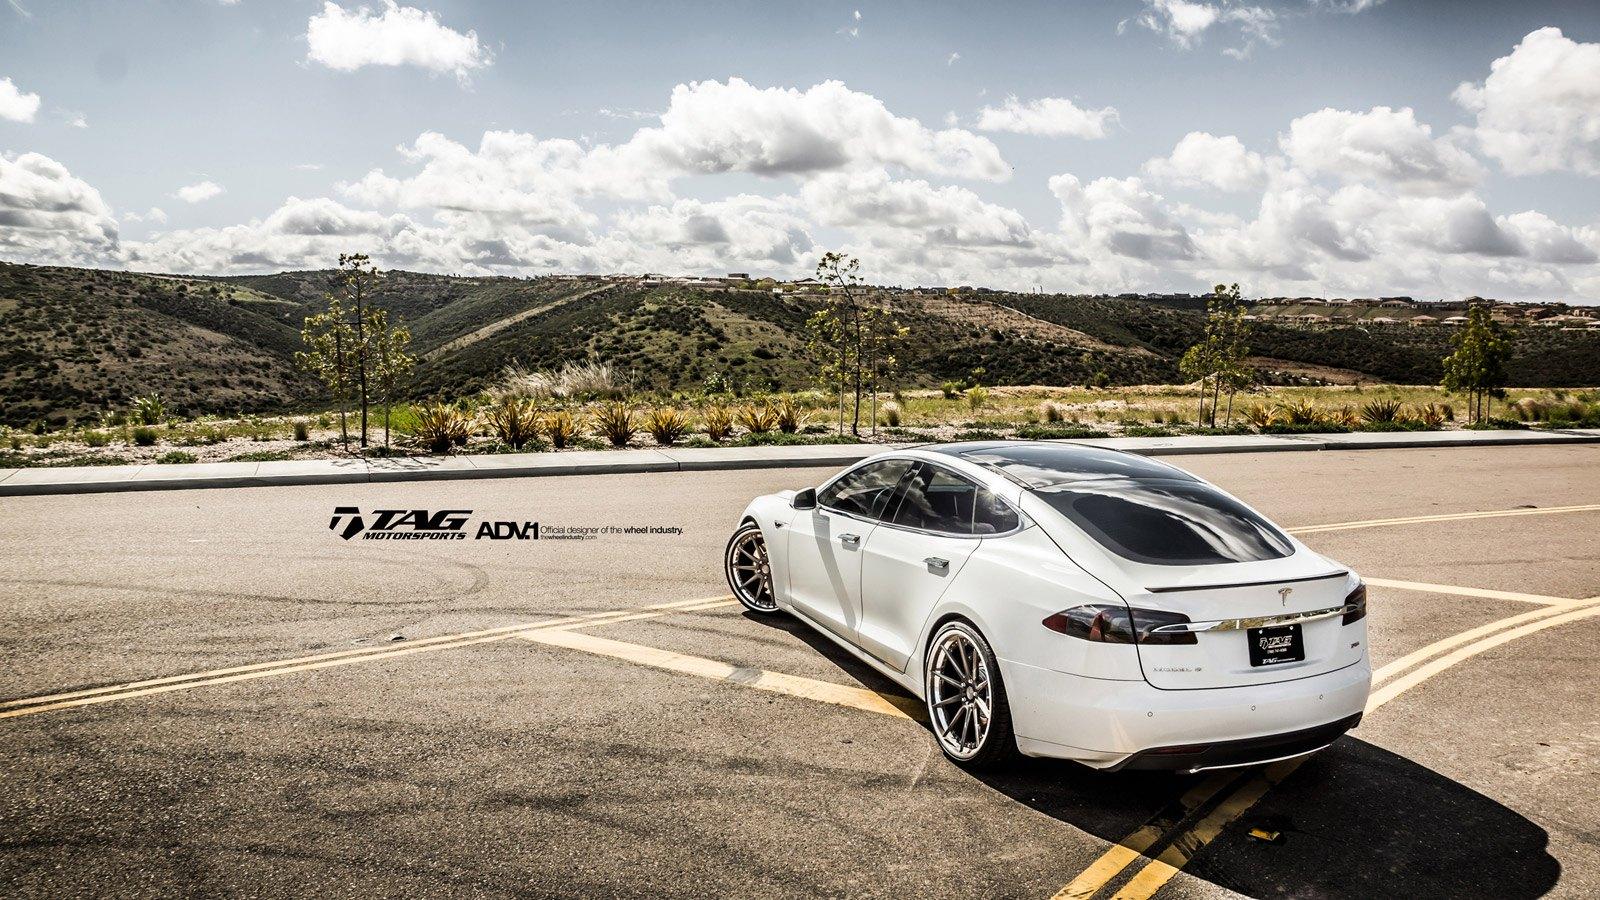 Car Enthusiast's Dream: White Tesla Model S on Custom Rims